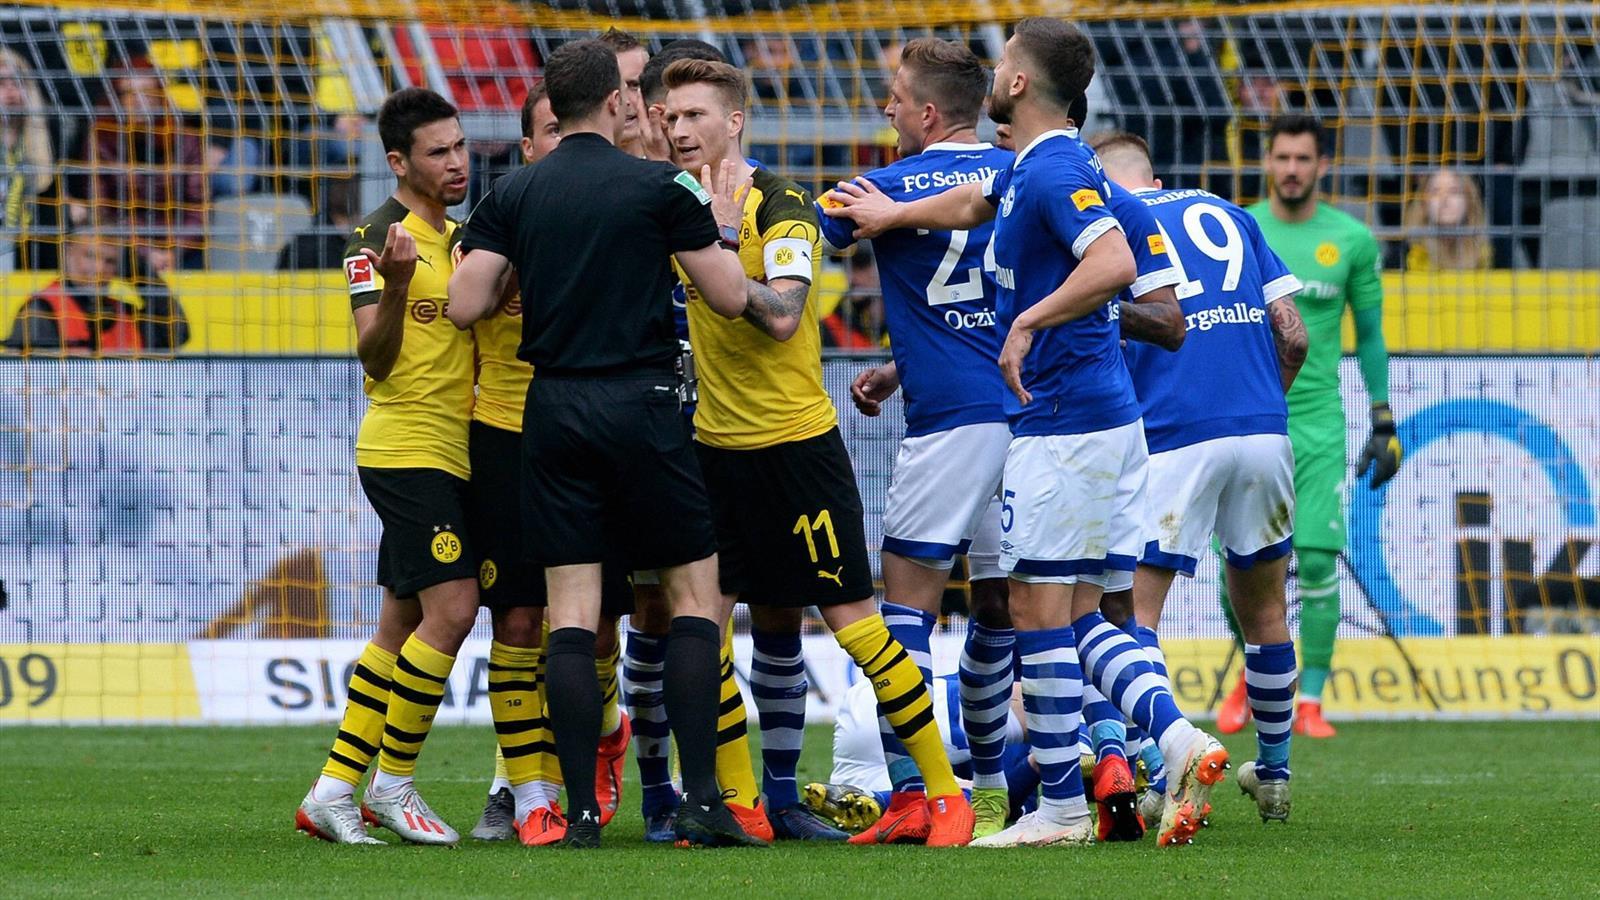 Stimmen Bvb Schalke 04 Der Grosste Skandal Im Fussball